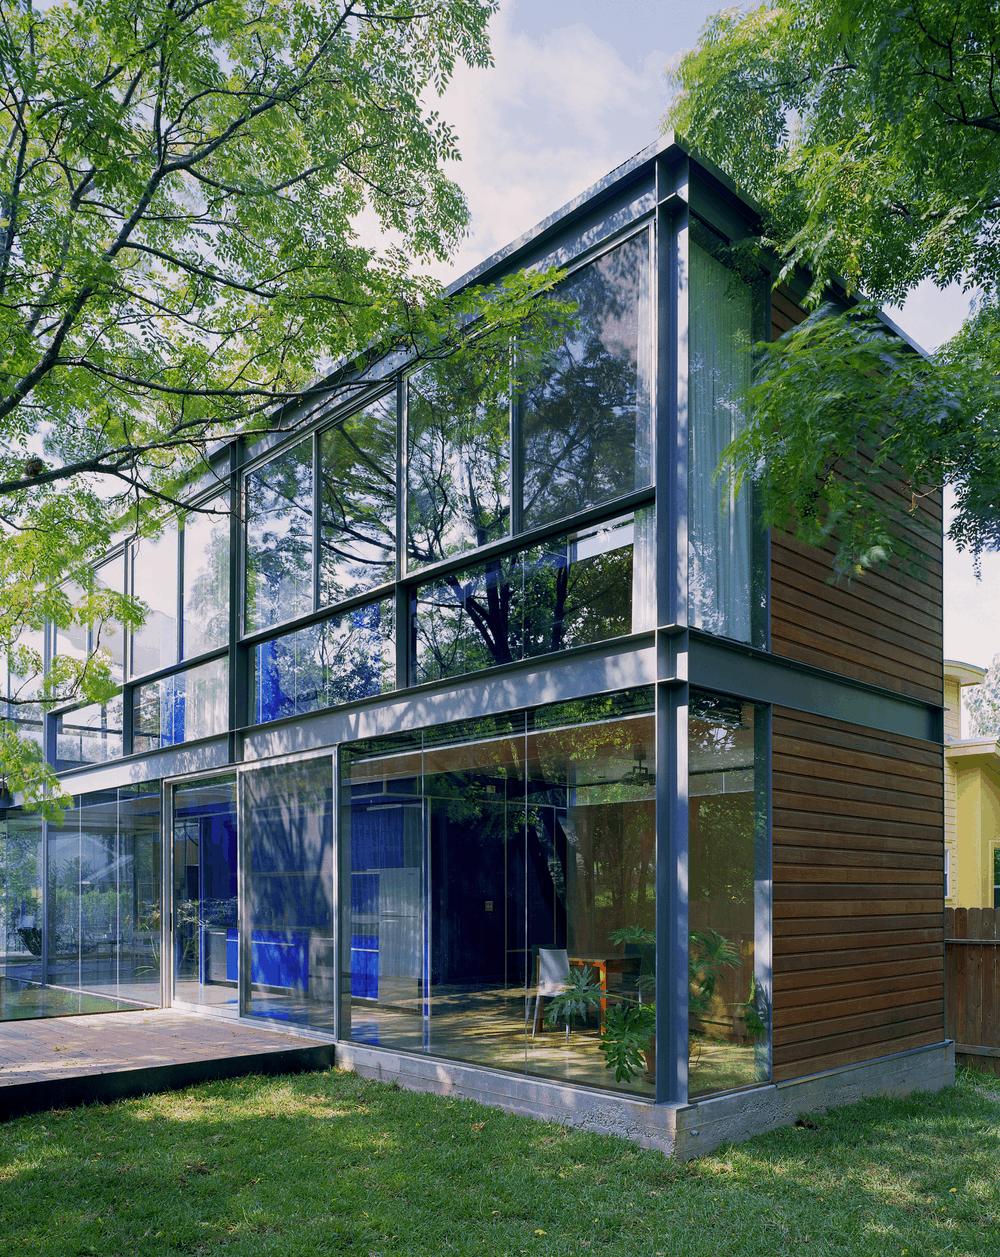 Moorish and Asian fusion for pavilion architecture